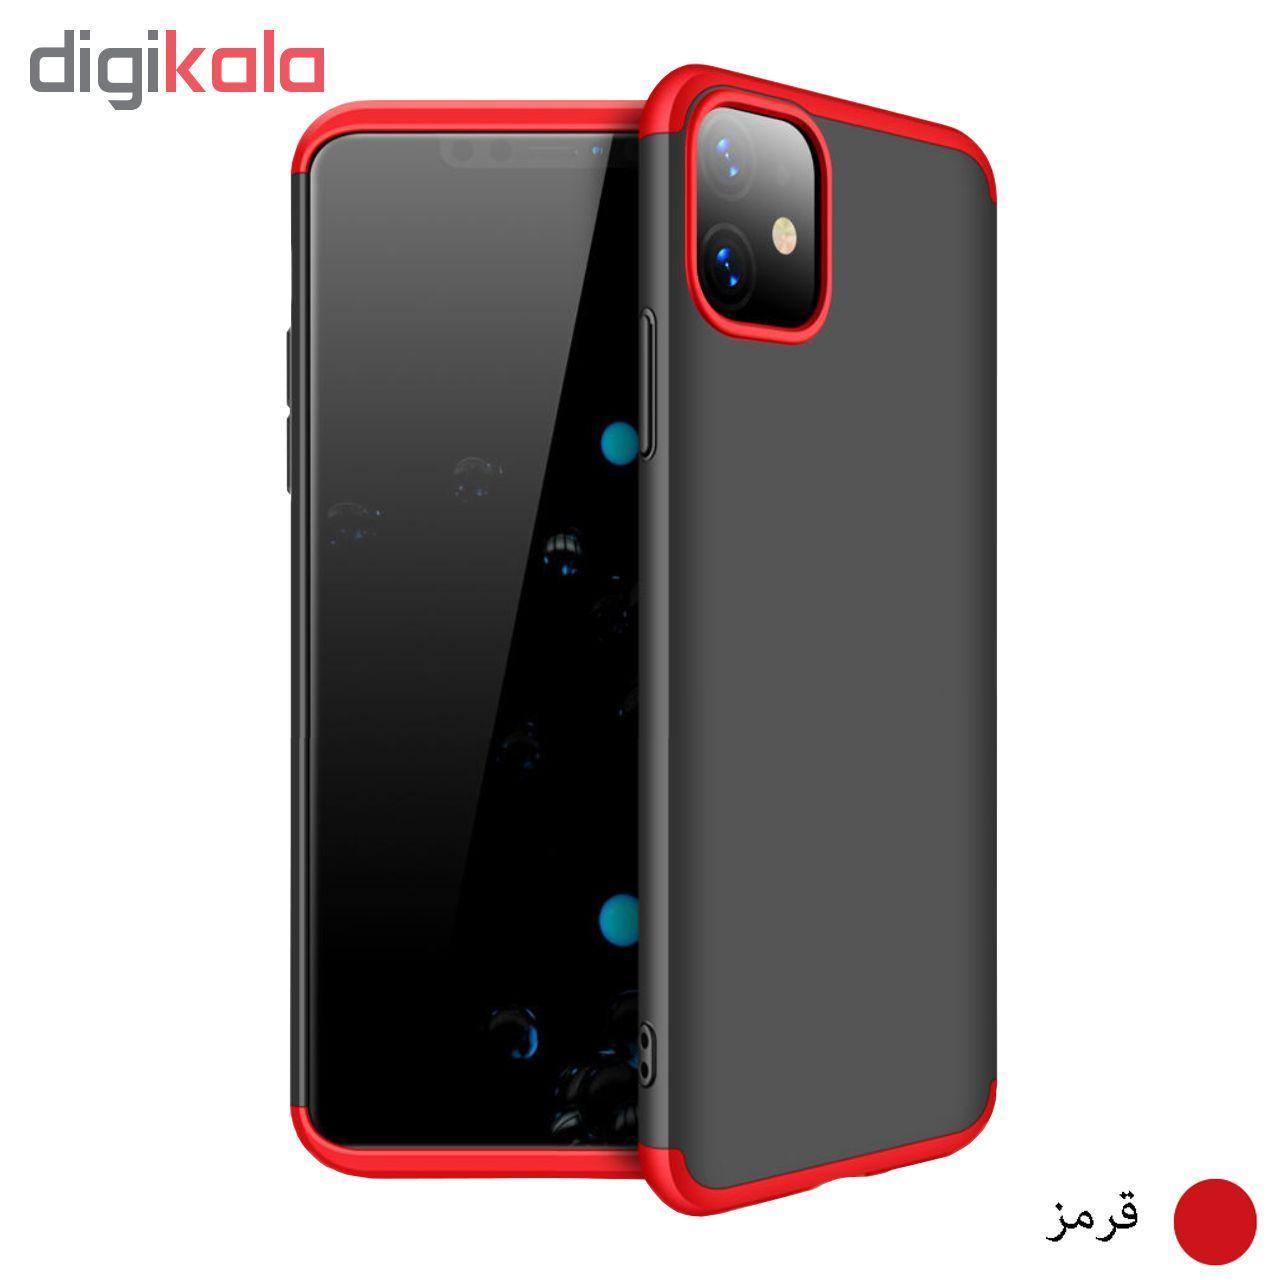 کاور 360 درجه جی کی کی مدل GK مناسب برای گوشی موبایل اپل IPhone 11 Pro Max main 1 2